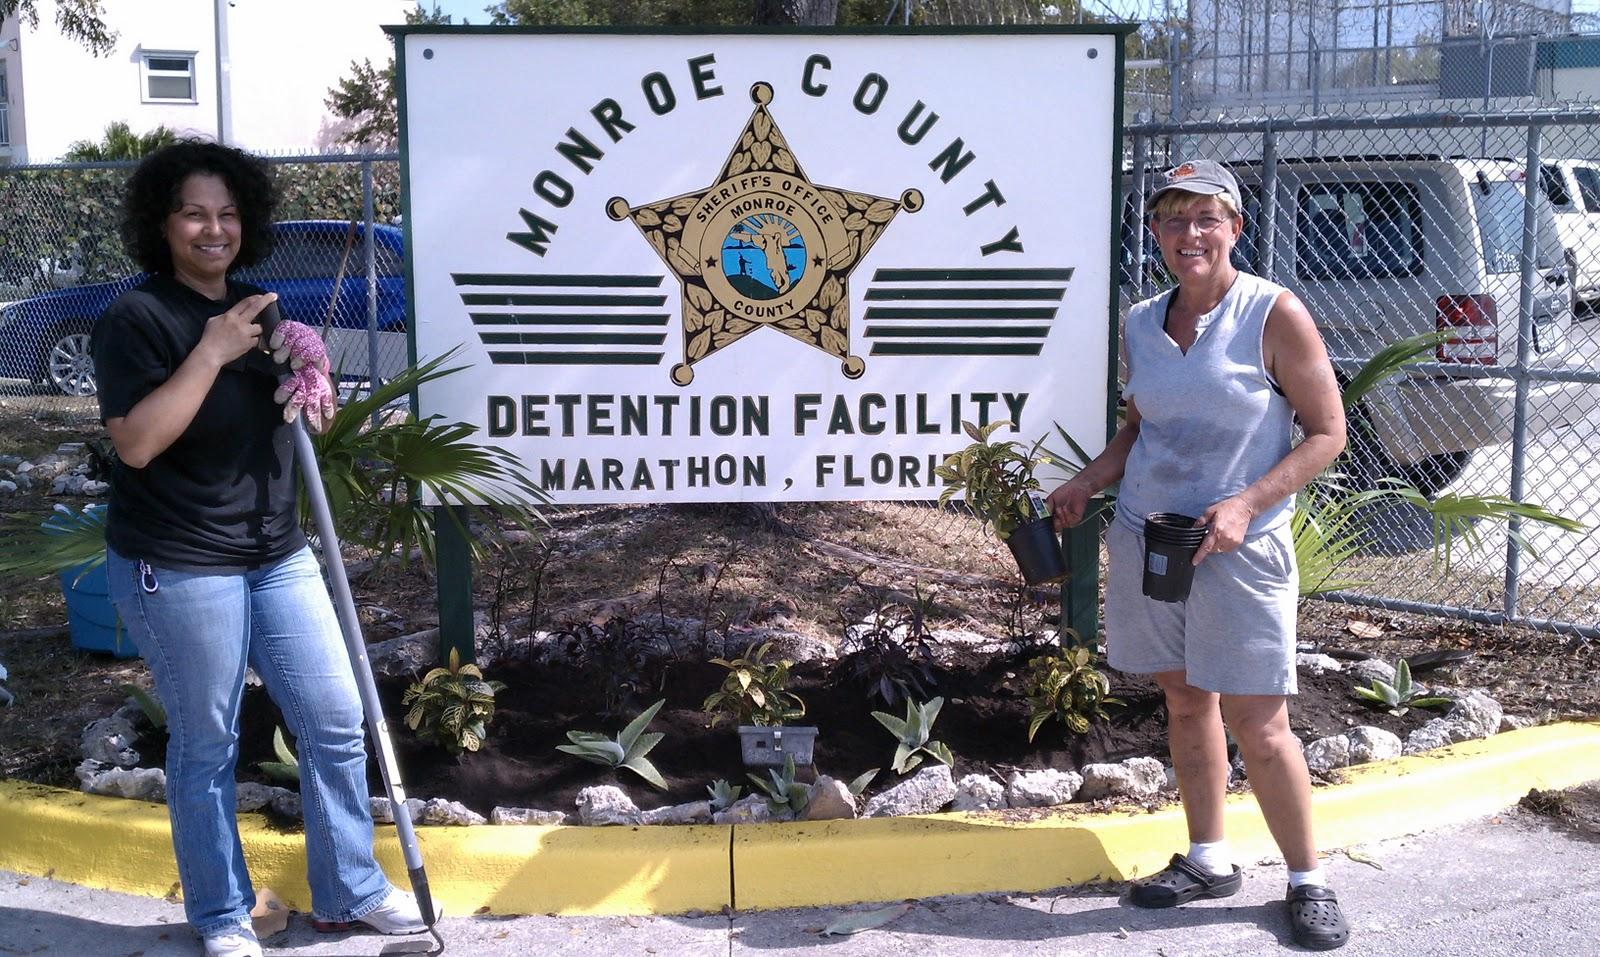 Pike County Correctional Facility Jobs